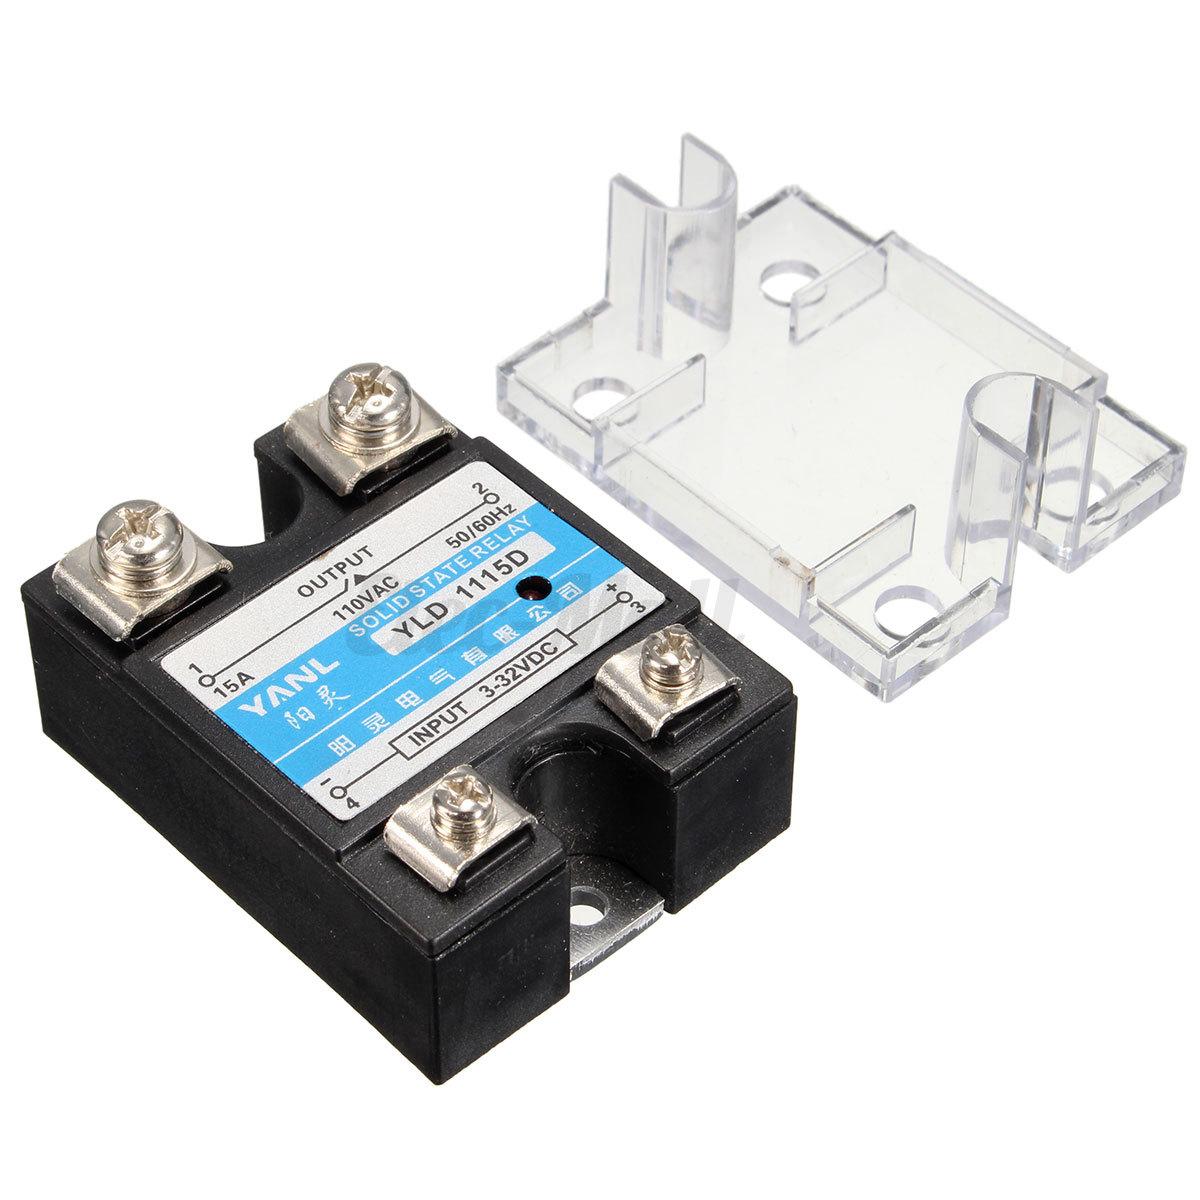 DC 5V 220V Solid State Relay for Temperature Controller Arduino eBay #0E84BD